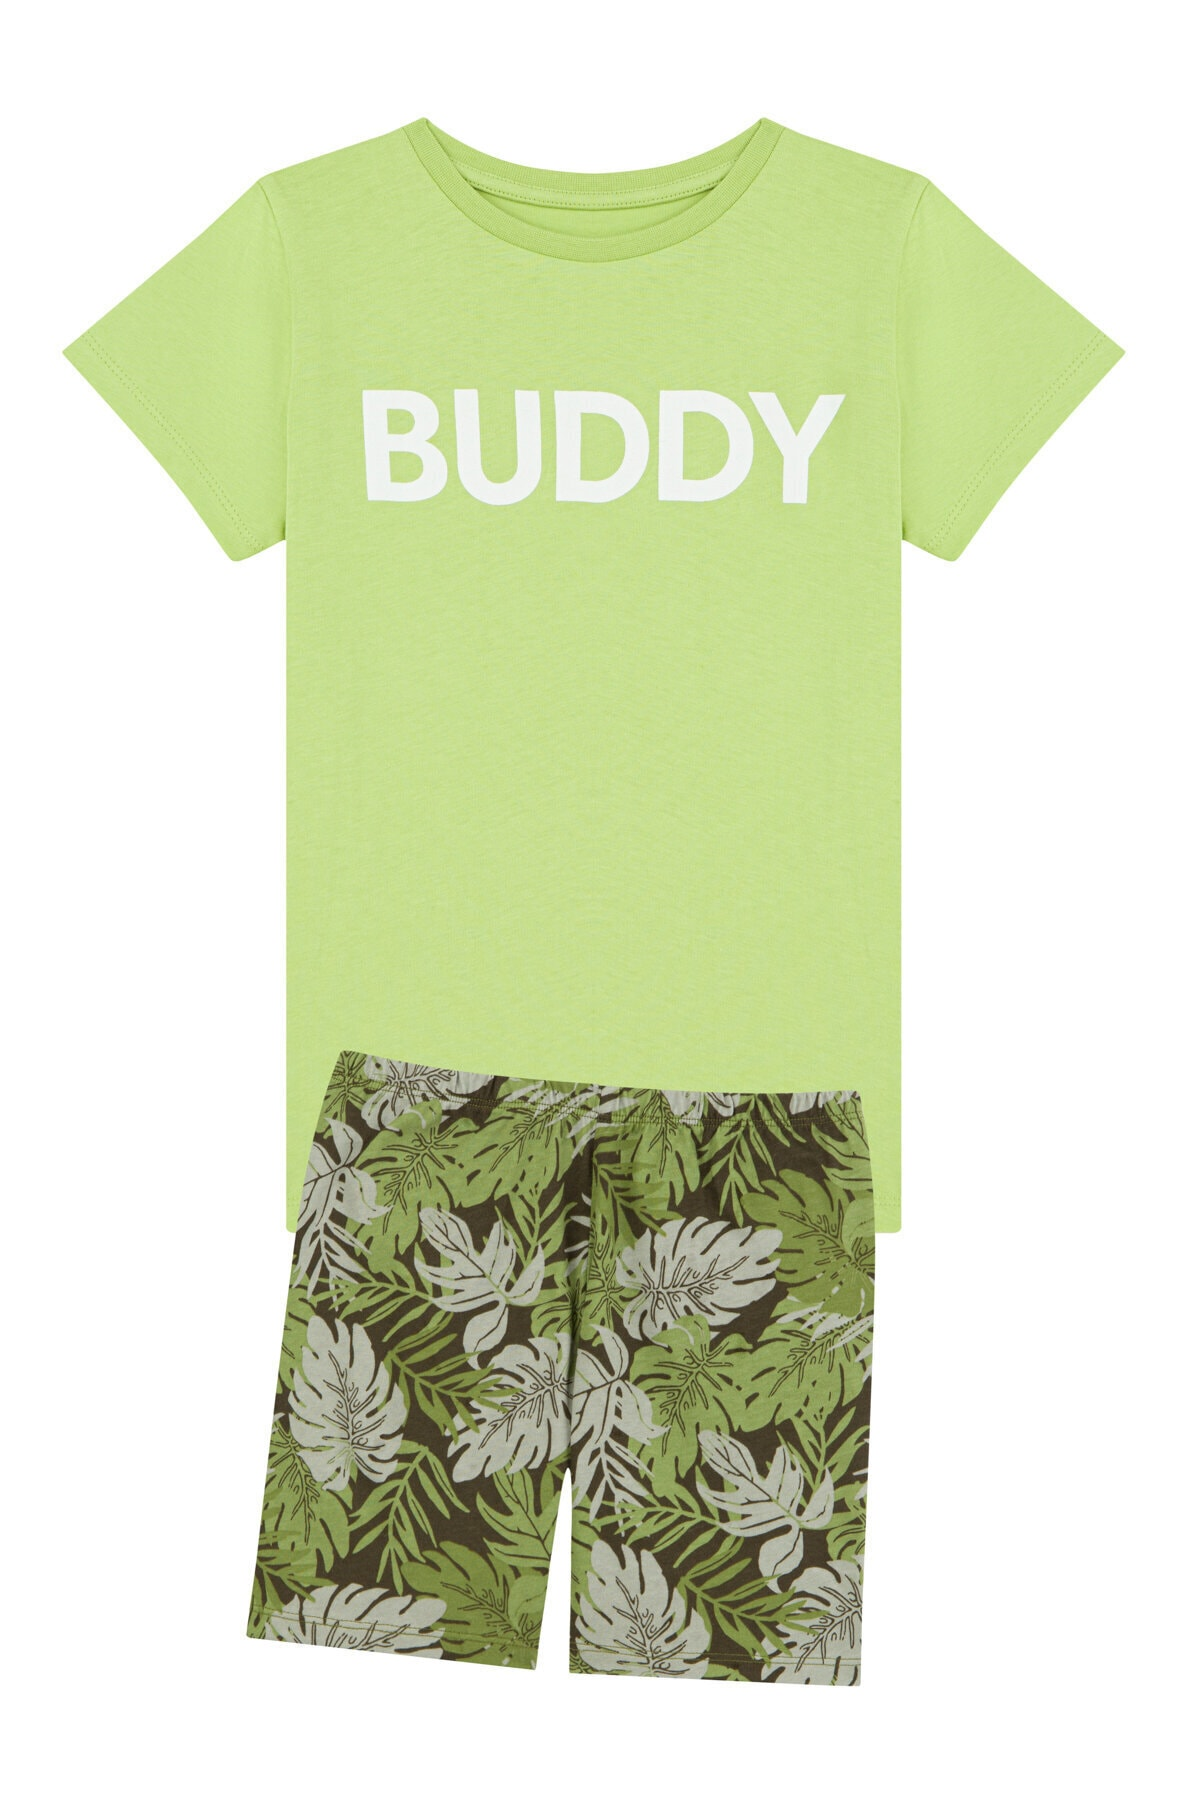 Penti Çok Renkli Erkek Çocuk Buddy  2Li Pijama Takımı